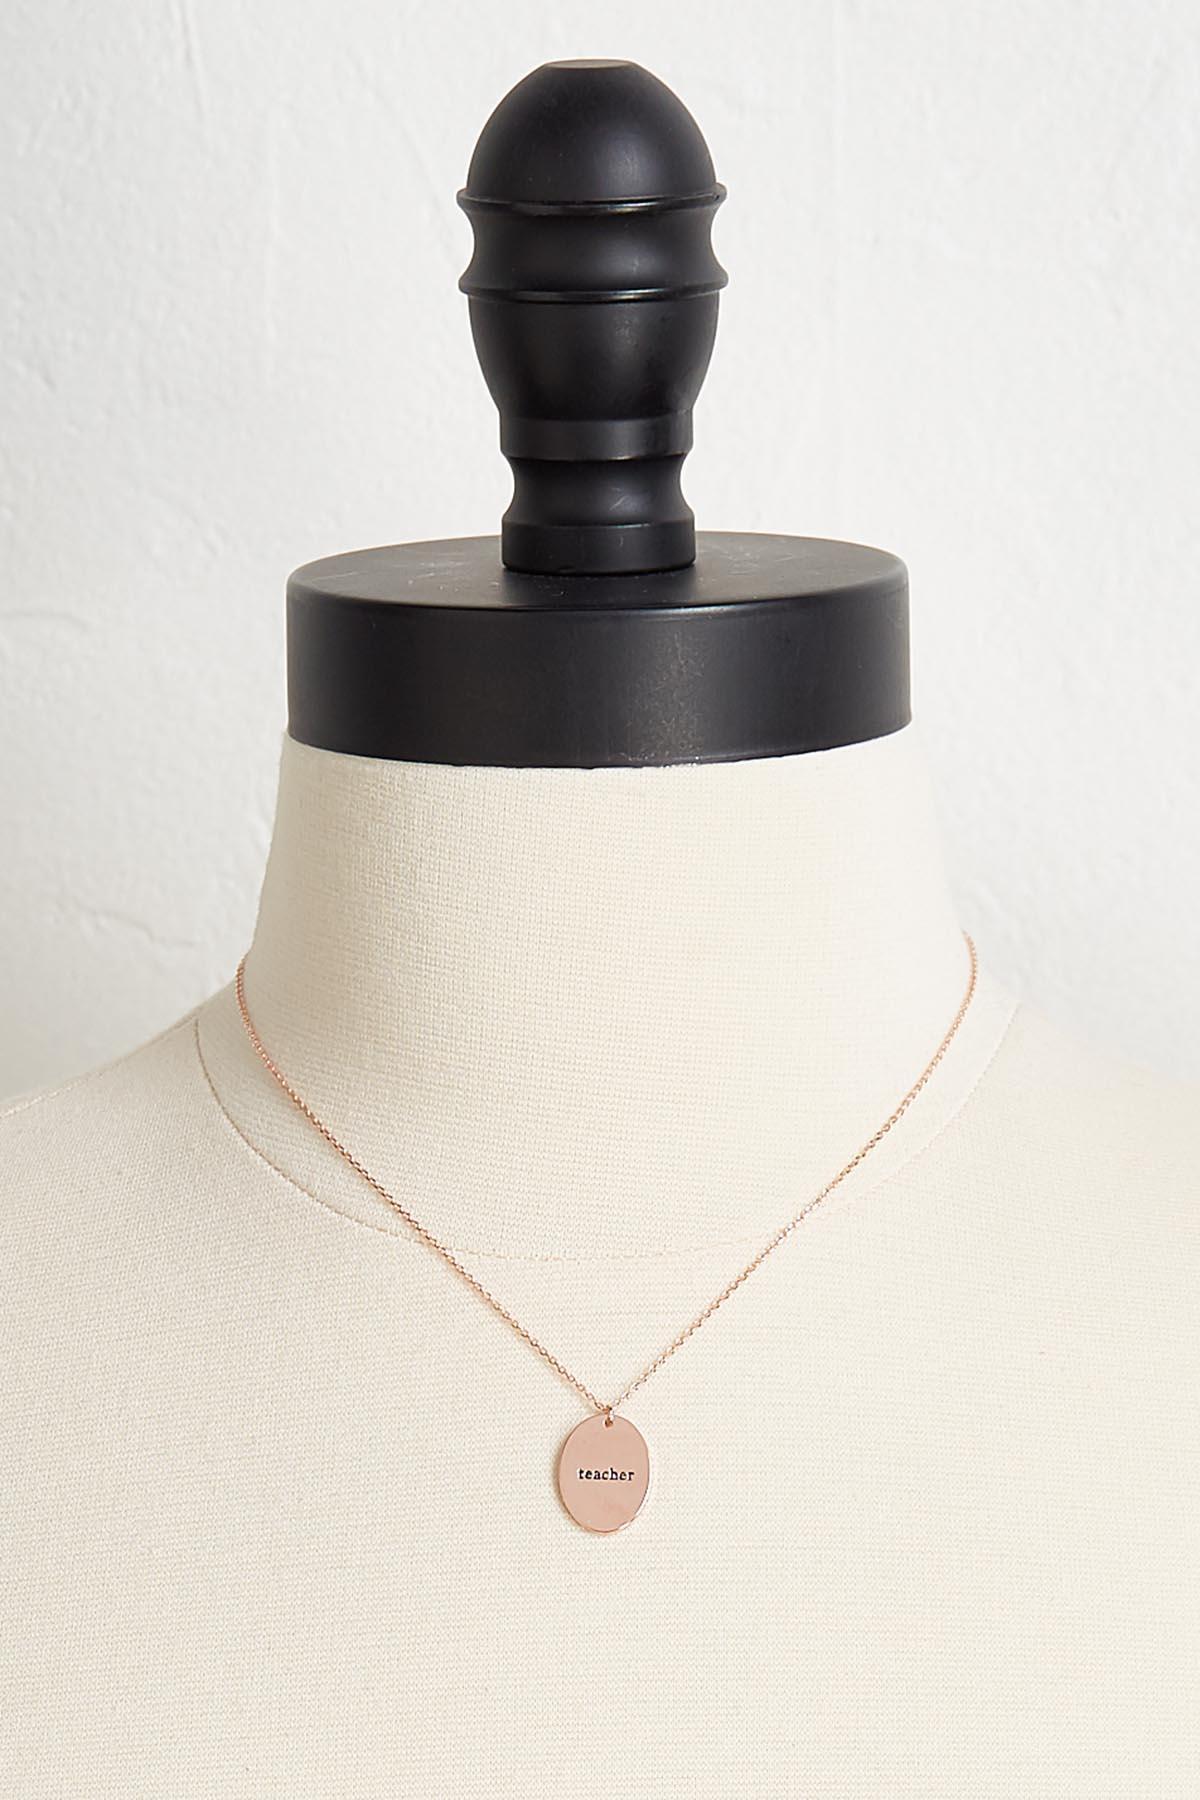 Engraved Teacher Pendant Necklace